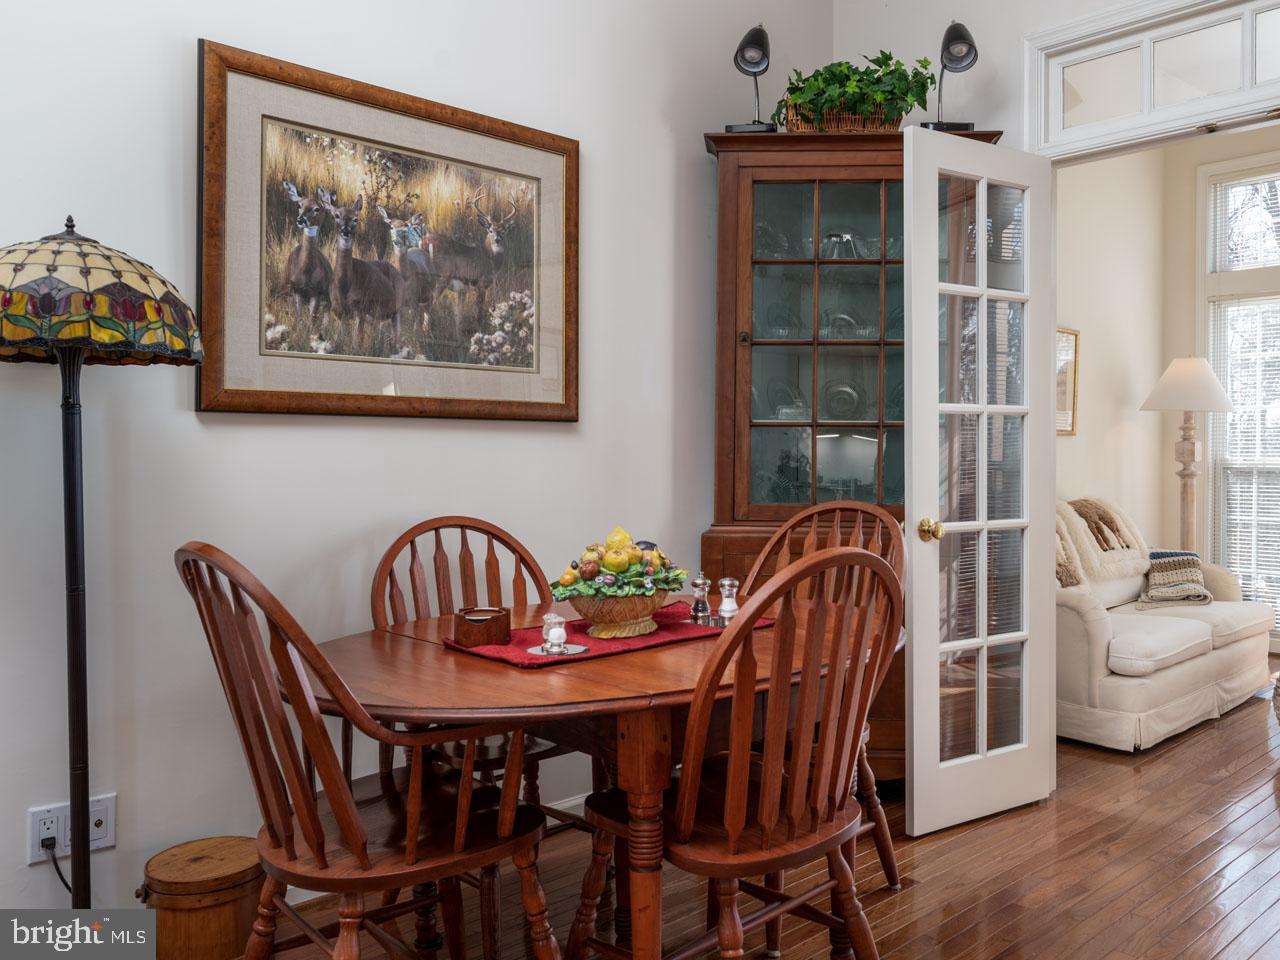 VAFX1104336-302201658677-2021-07-16-19-45-25  |   | Alexandria Delaware Real Estate For Sale | MLS# Vafx1104336  - Best of Northern Virginia